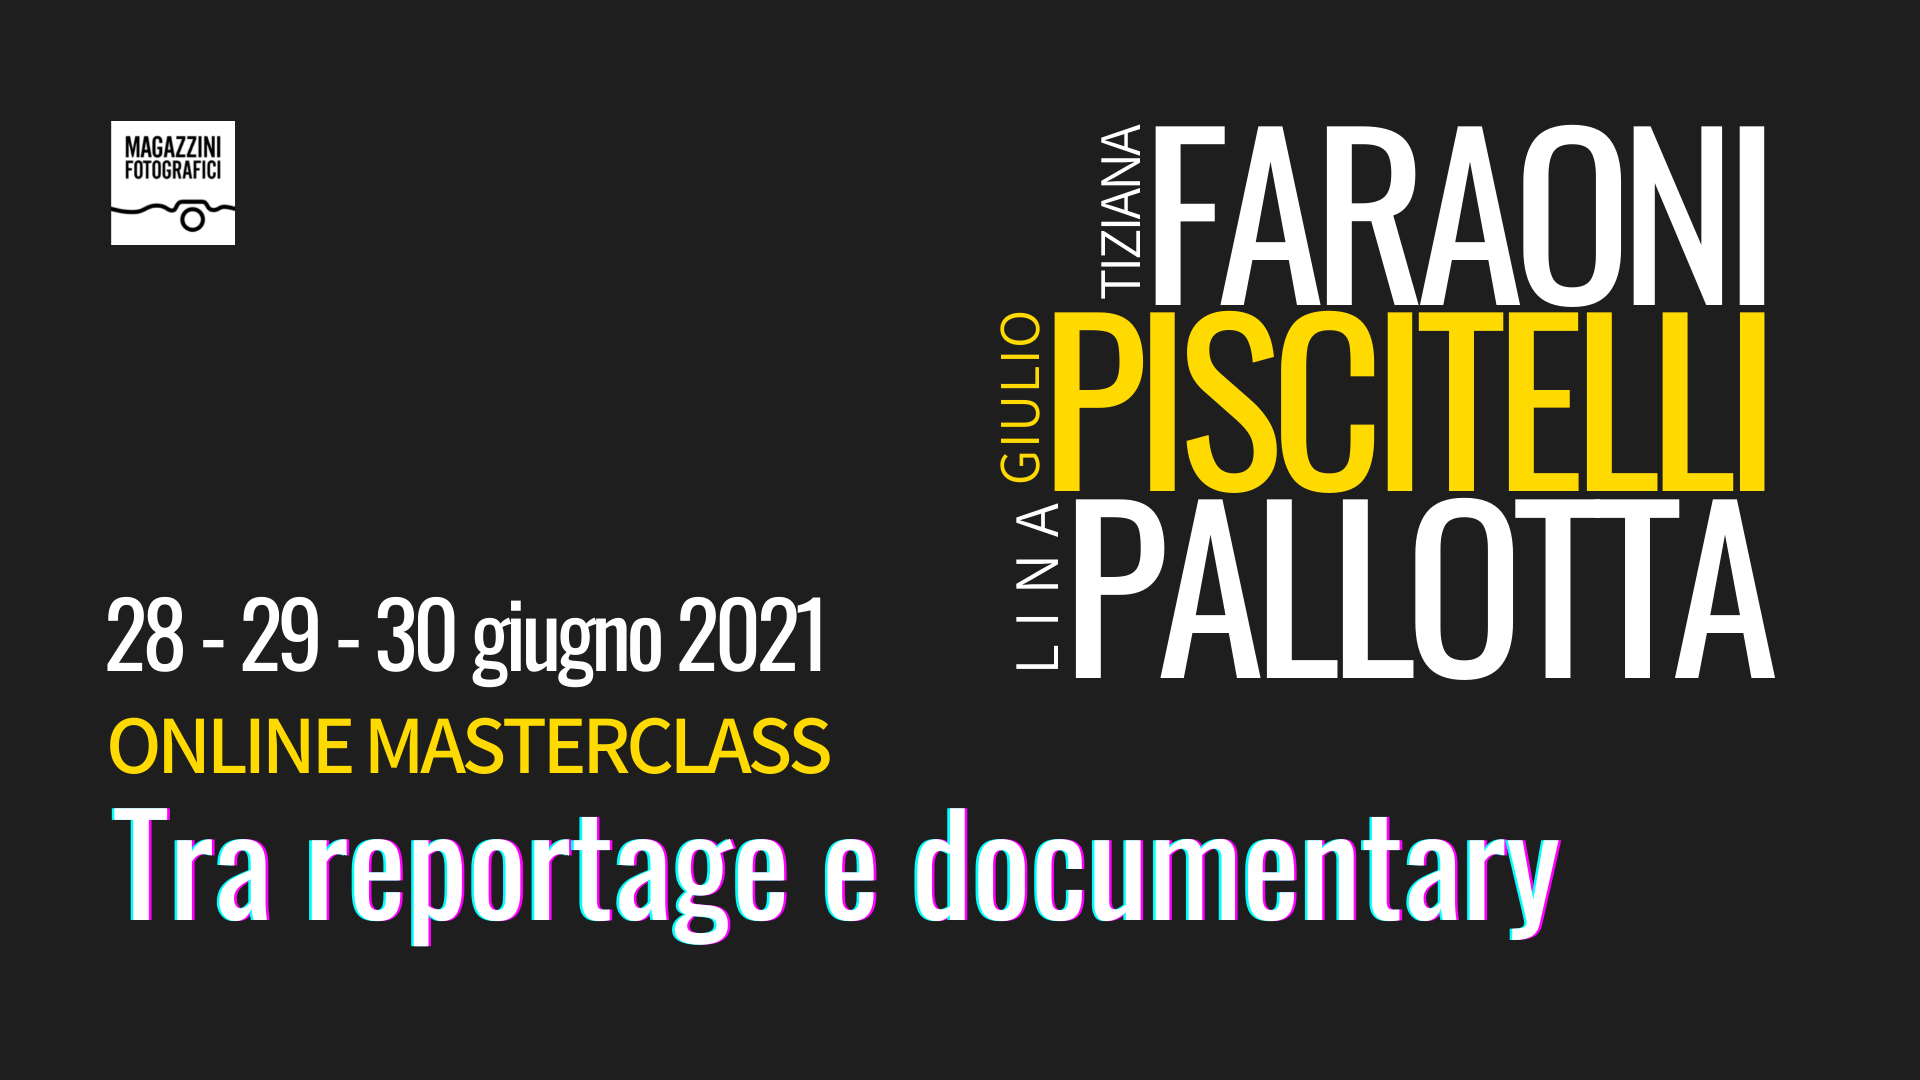 Locandina_Masterclass_Faraoni_Piscitelli_Pallotta